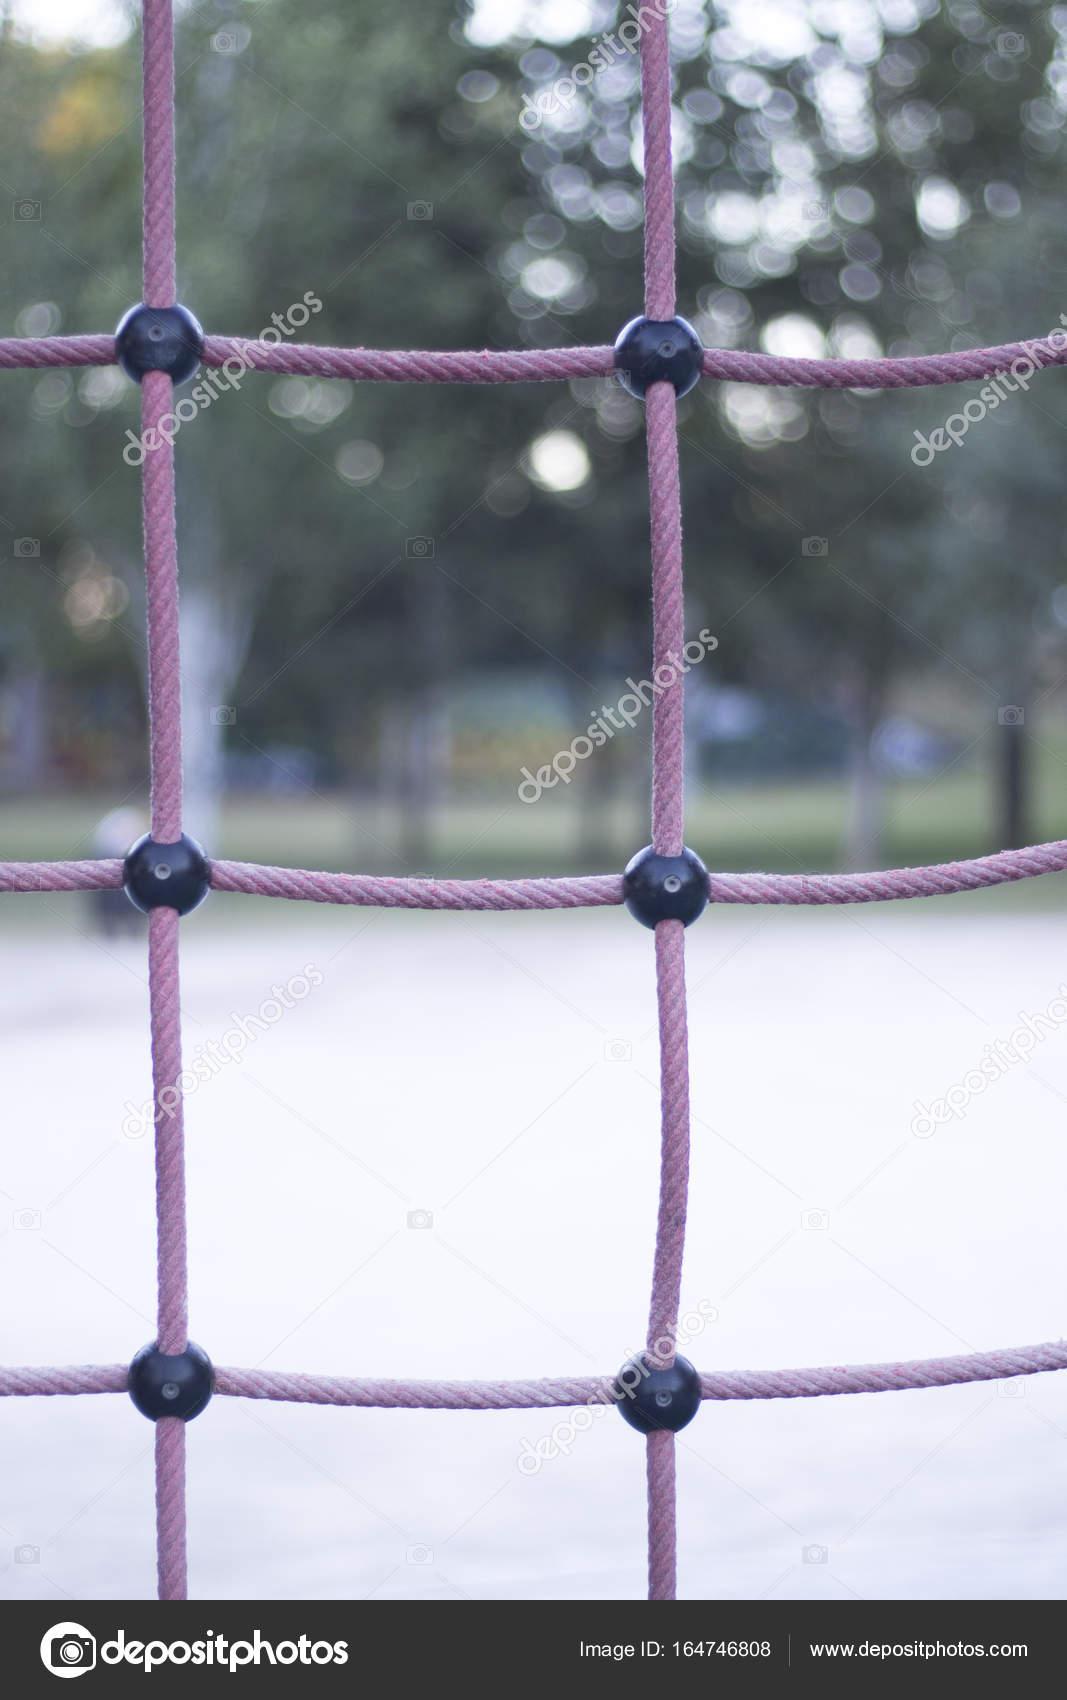 Park-Klettergerüst-Seile — Stockfoto © edwardolive #164746808